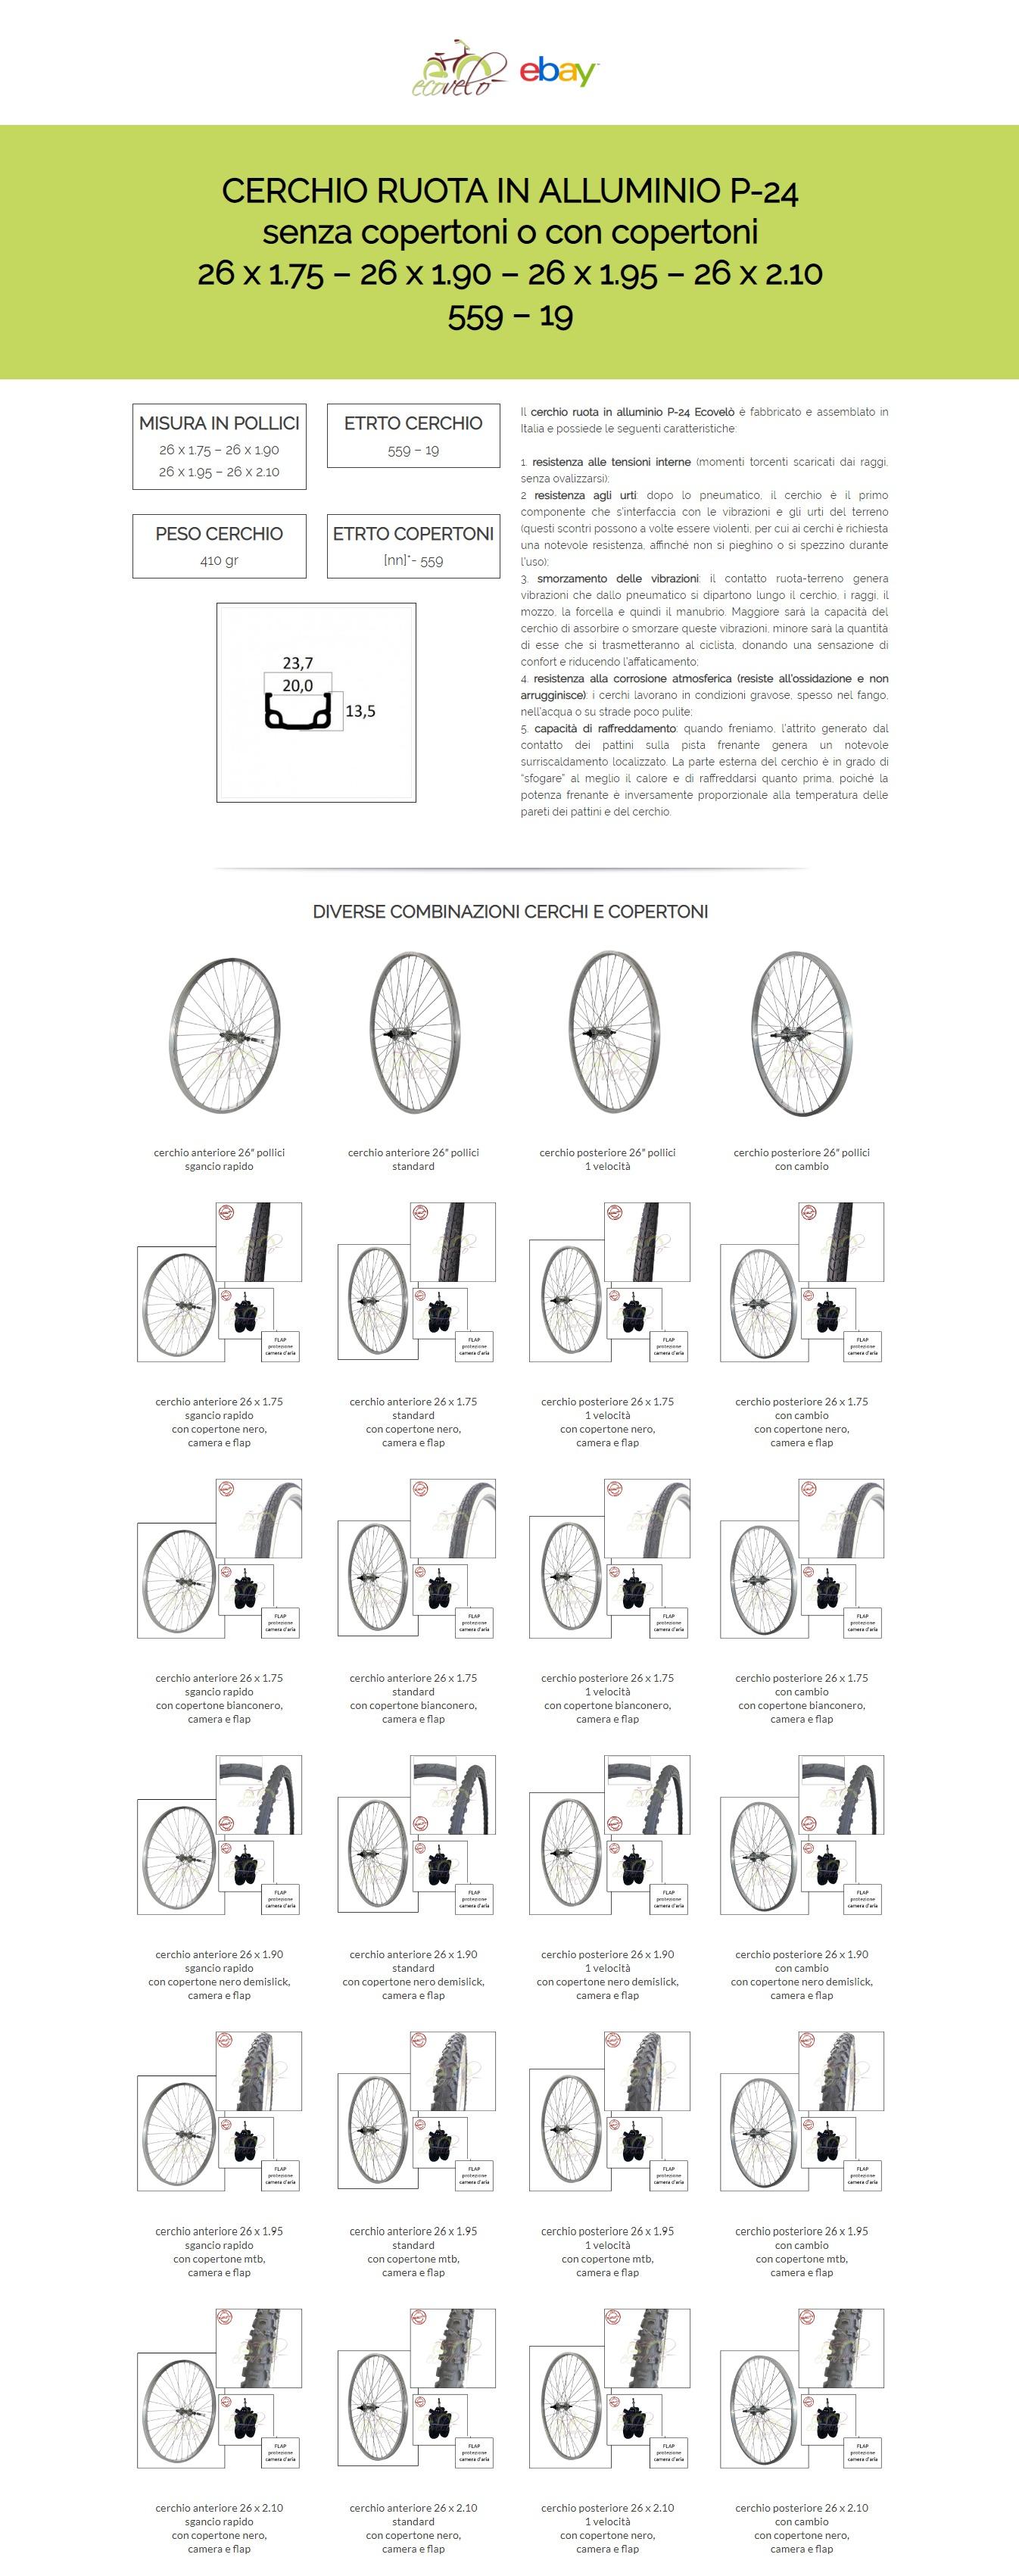 Ecovel/ò Cerchio Ruota 26 x 1.90 con COPERTONE Nero DEMISLICK Bici Bicicletta MTB Mountain Bike